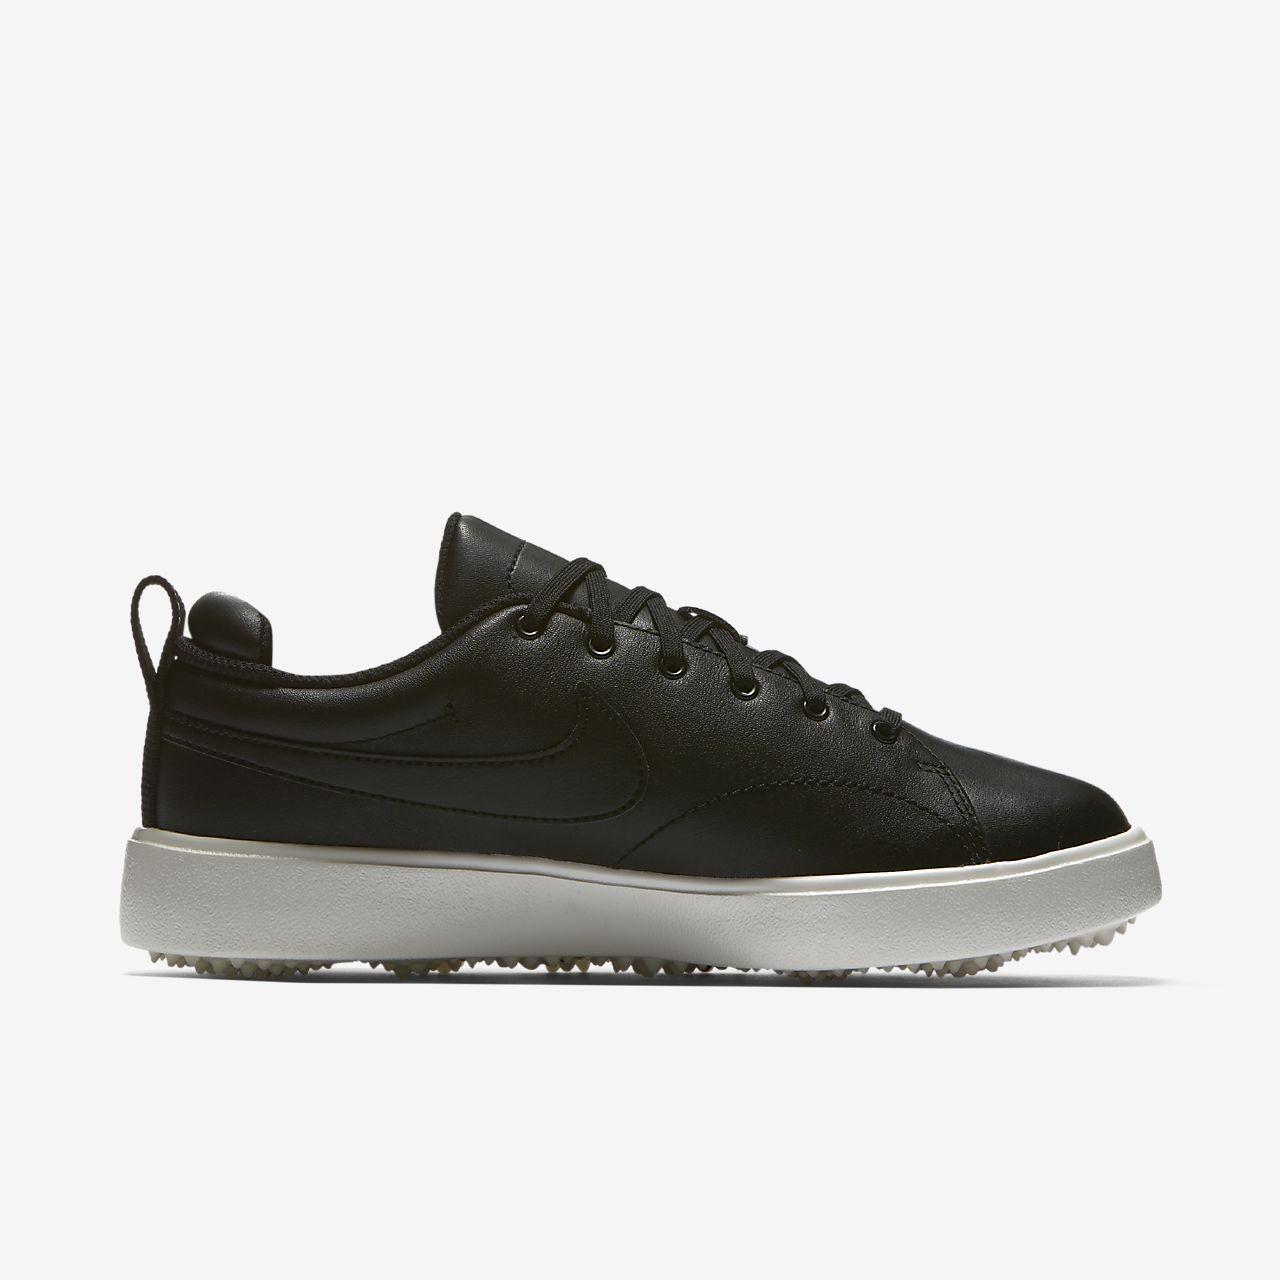 Nike Damen Wmns Course Classic Golfschuhe, Schwarz (Black/Black/Sail 001), 36 EU